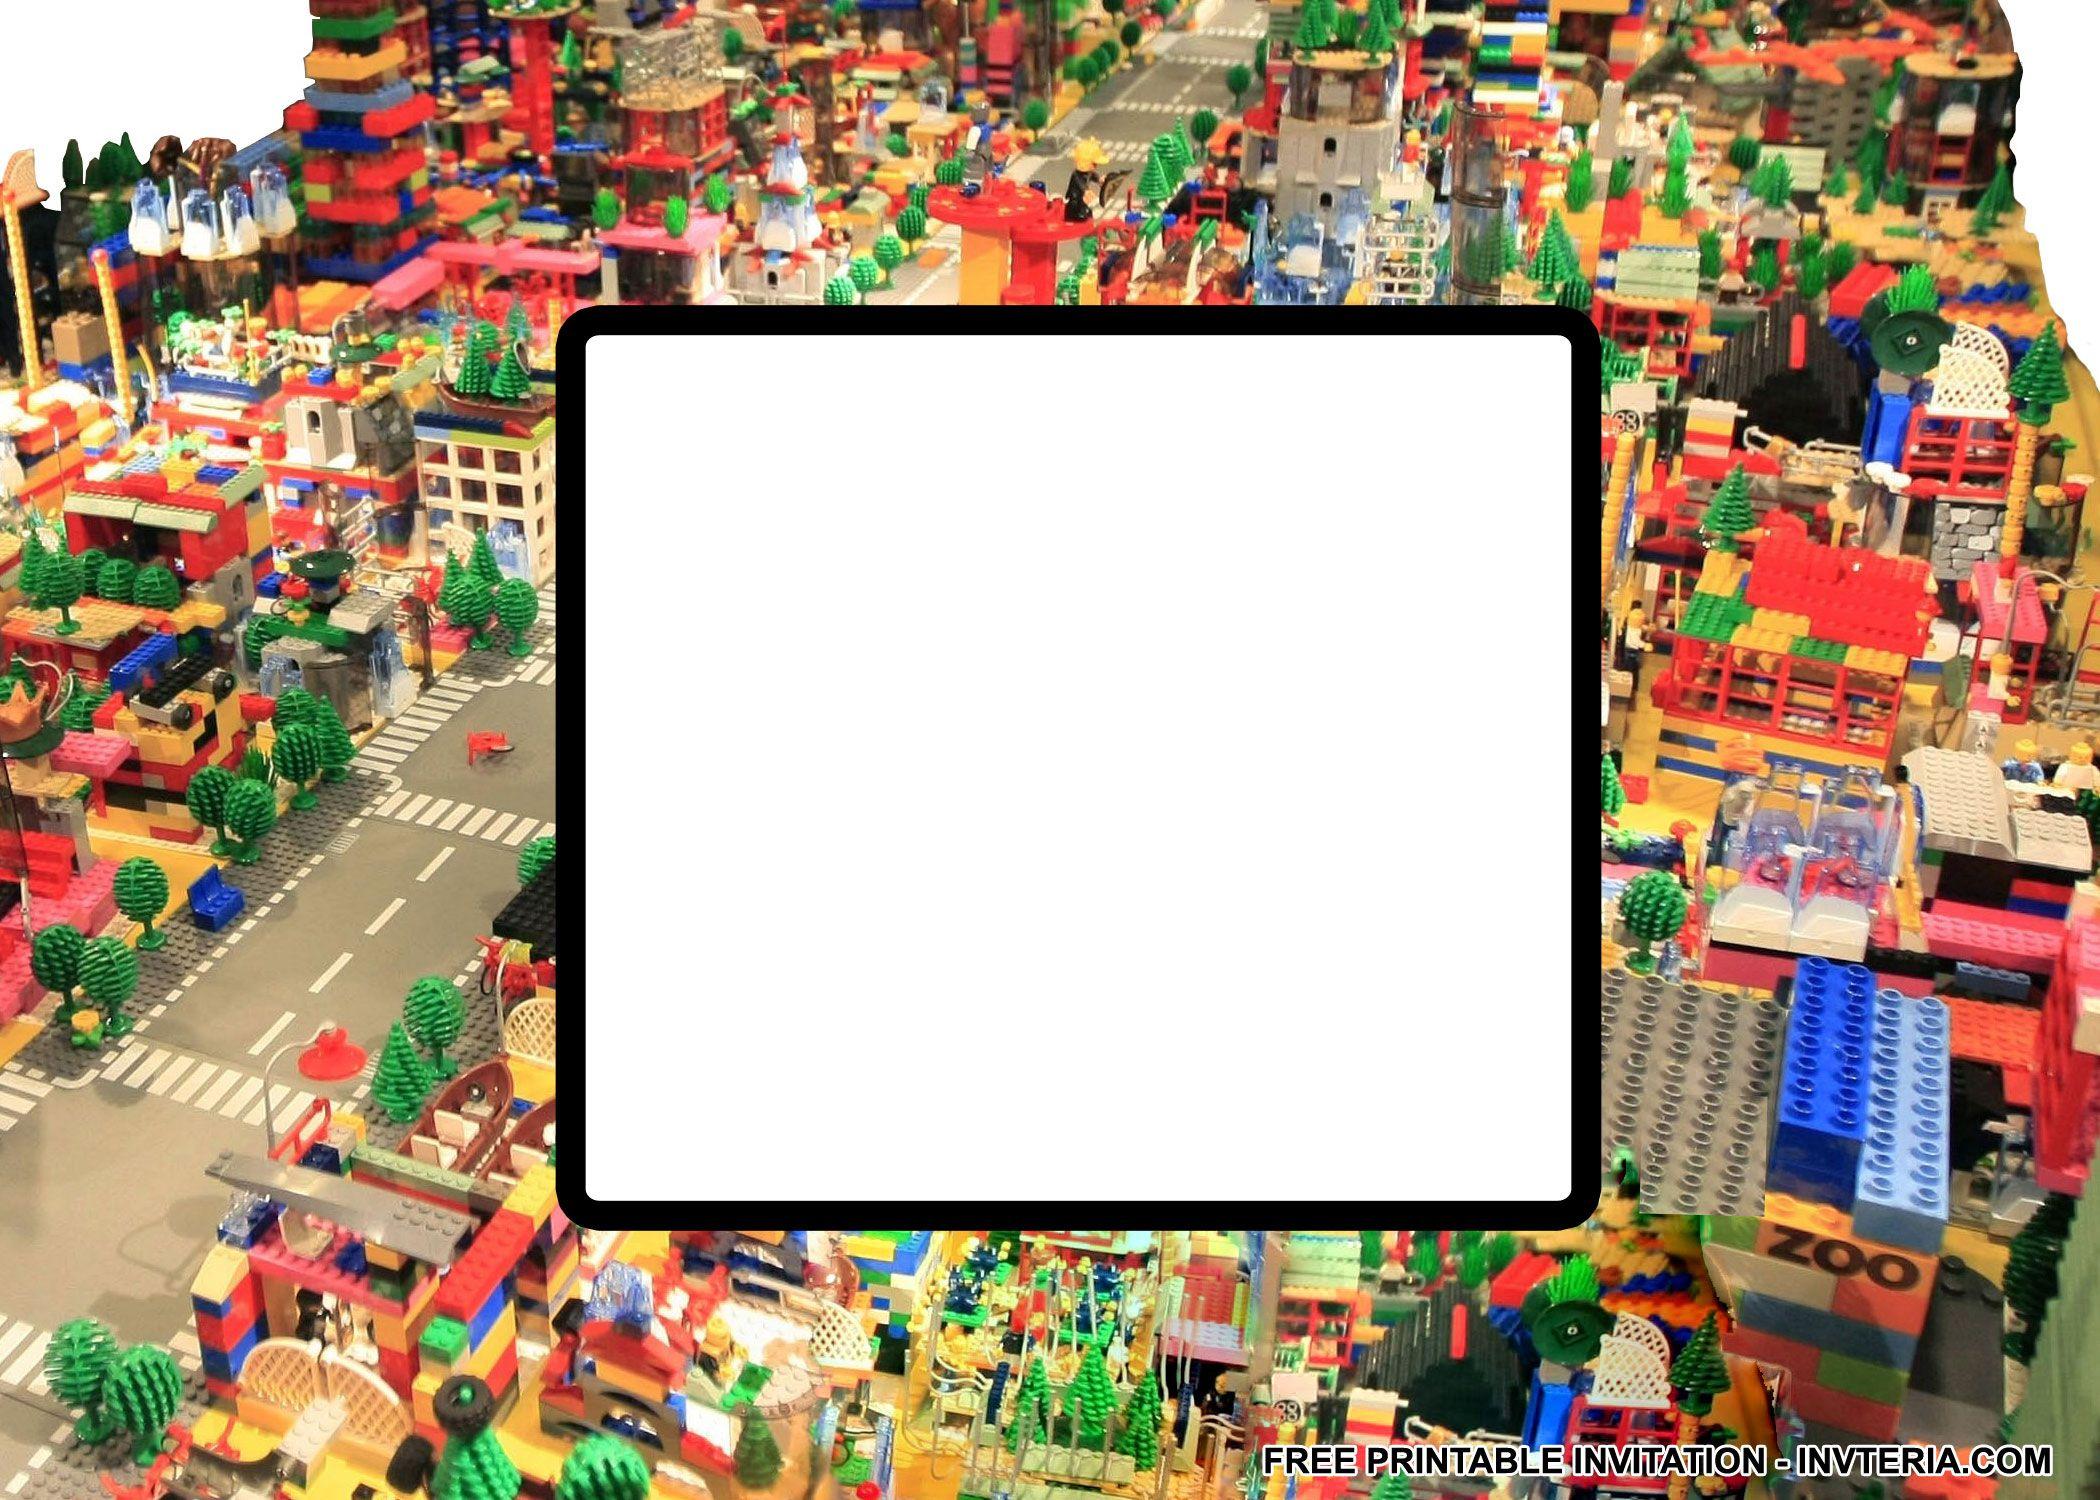 FINE BEST FREE PRINTABLE LEGO BIRTHDAY INVITATIONS IDEA   Invitation ...